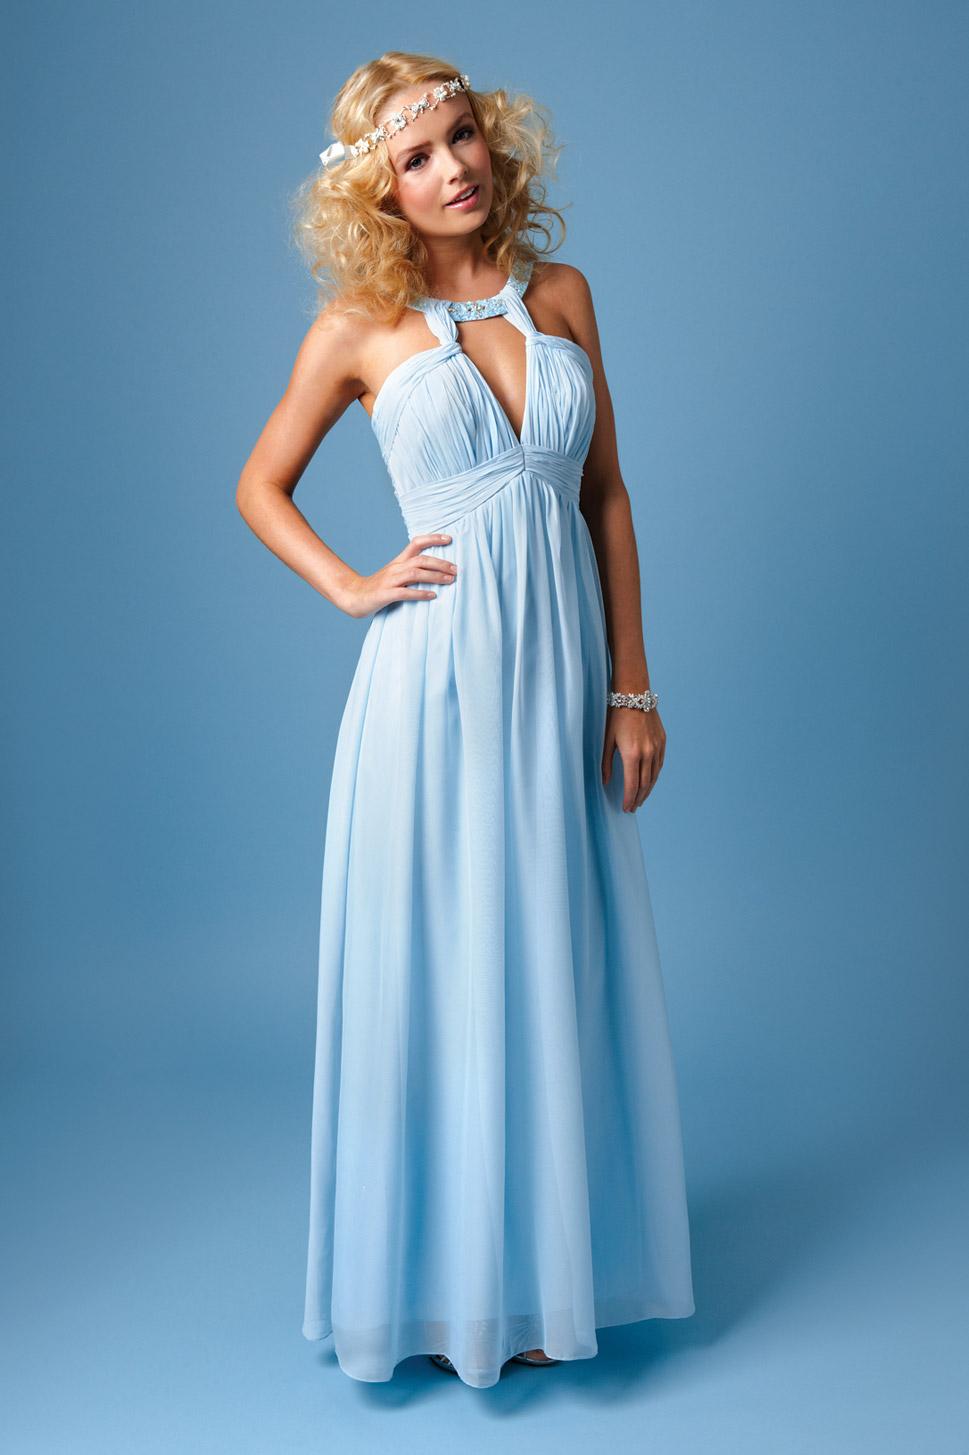 Honey Buy: Amanda Wyatt 2012 spring and summer prom dresses